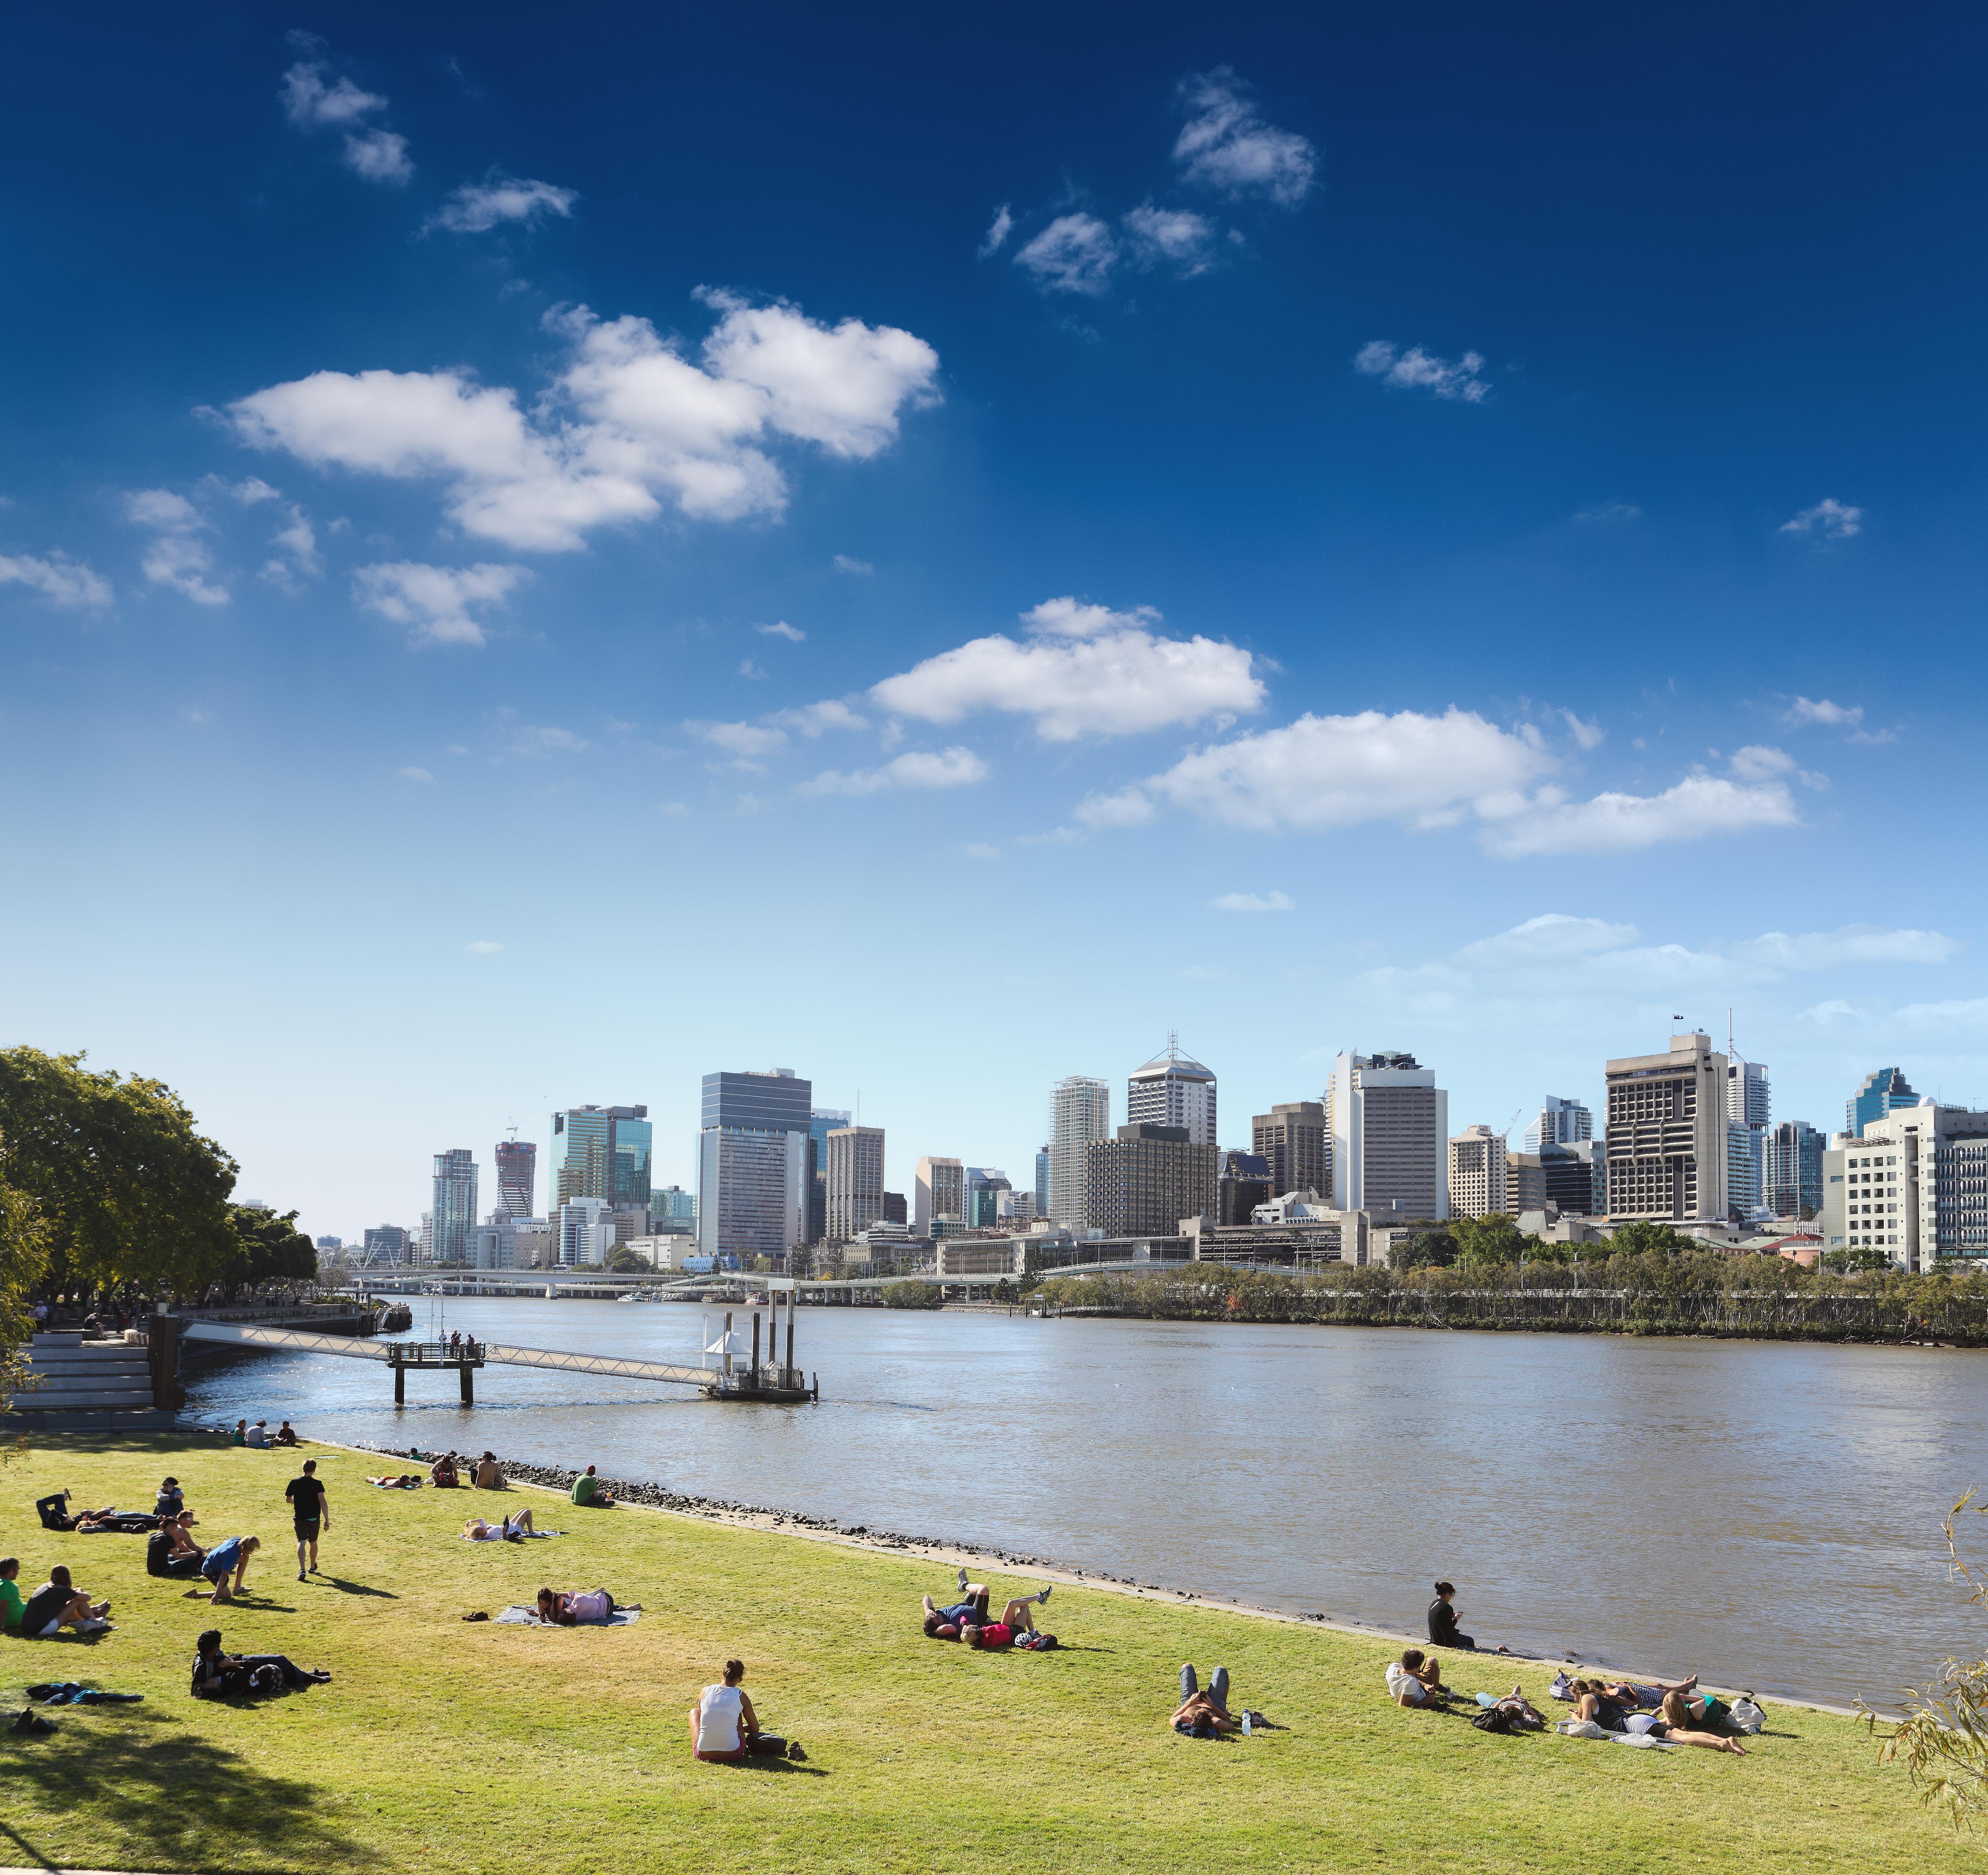 kristna dejtingsajter Brisbane